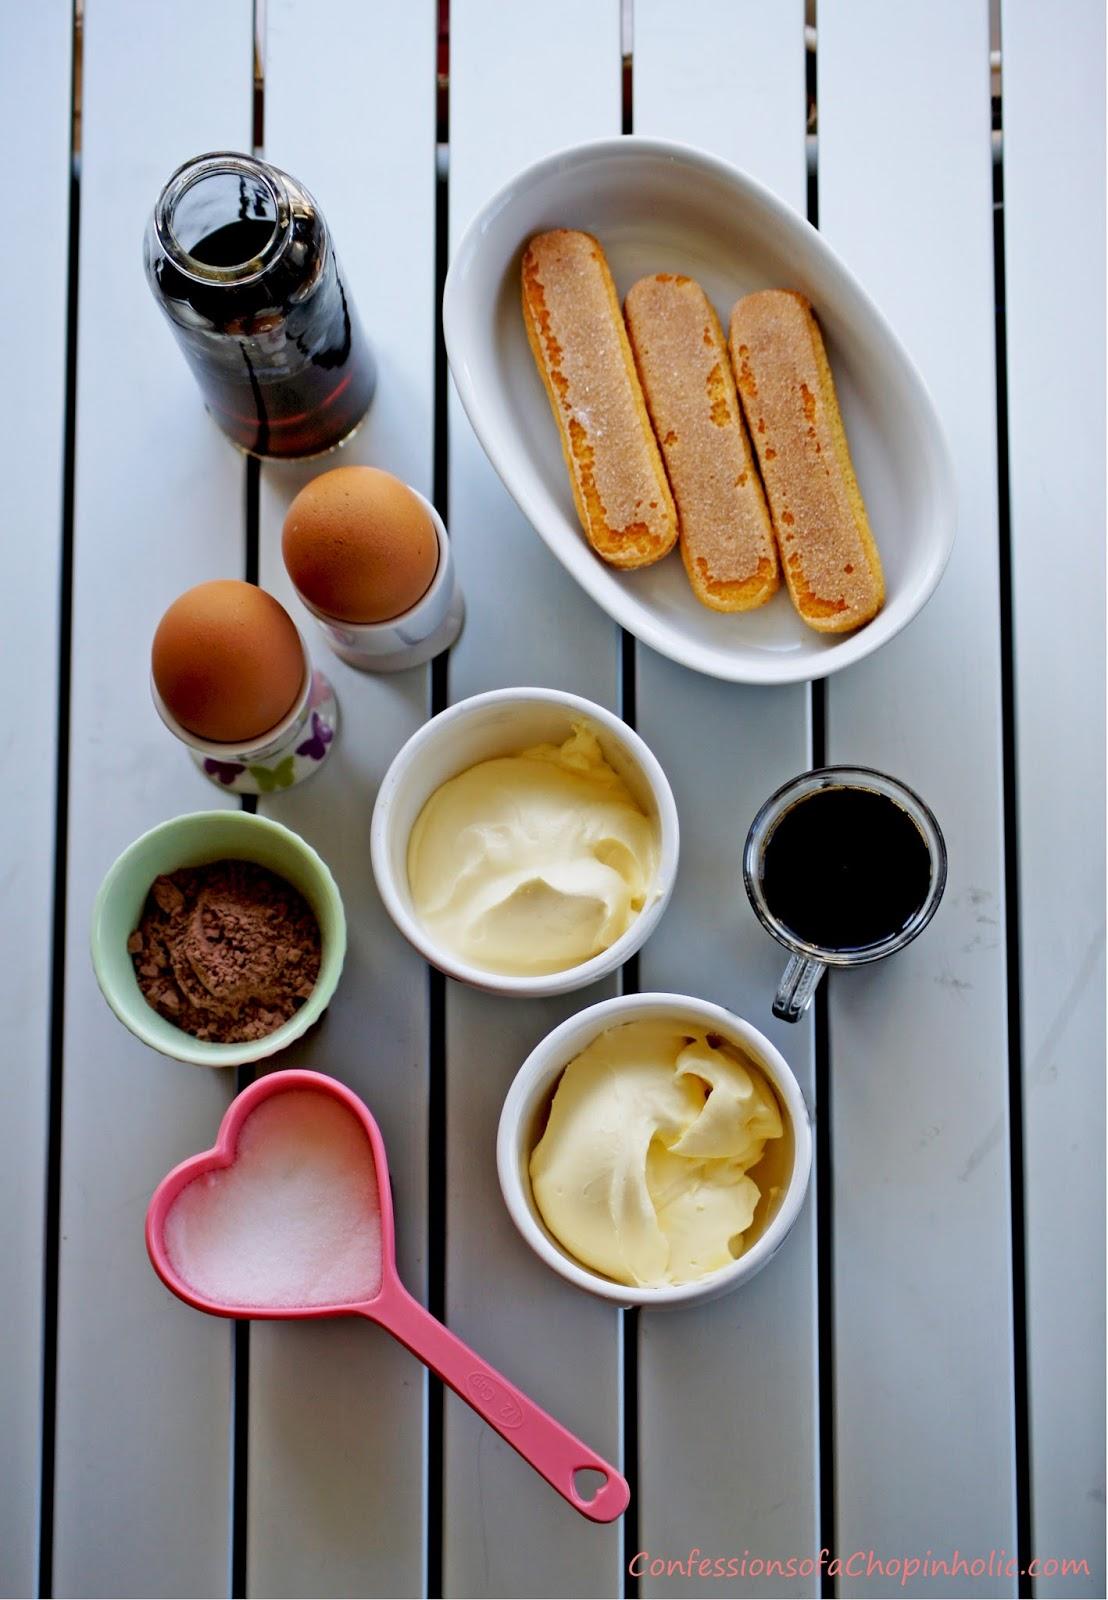 tiramisu ingredients, best tiramisu, italian tiramisu, zabaglione, savoiardi, egg yolk, marsala wine,